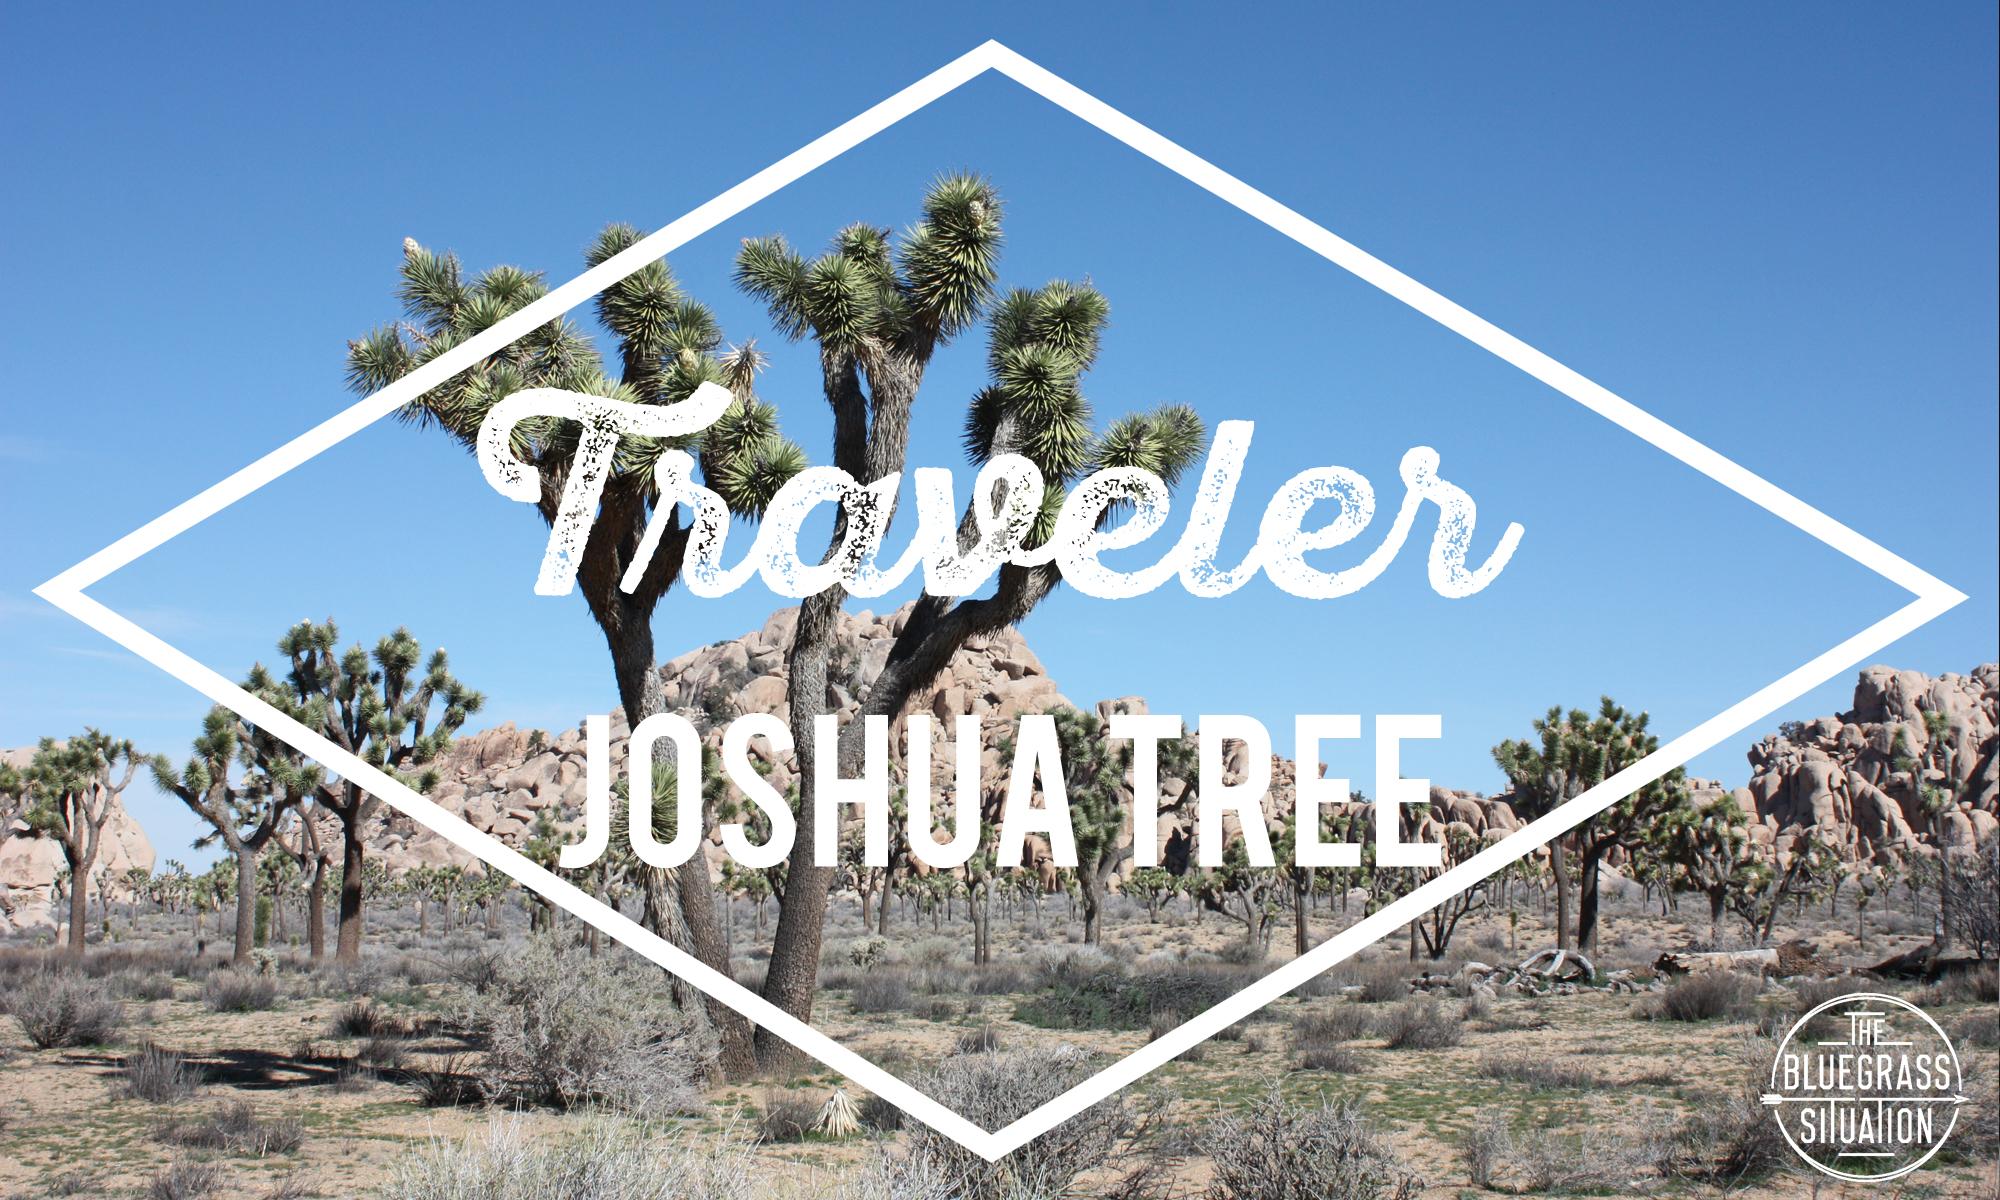 Traveler: Your Guide to Joshua Tree